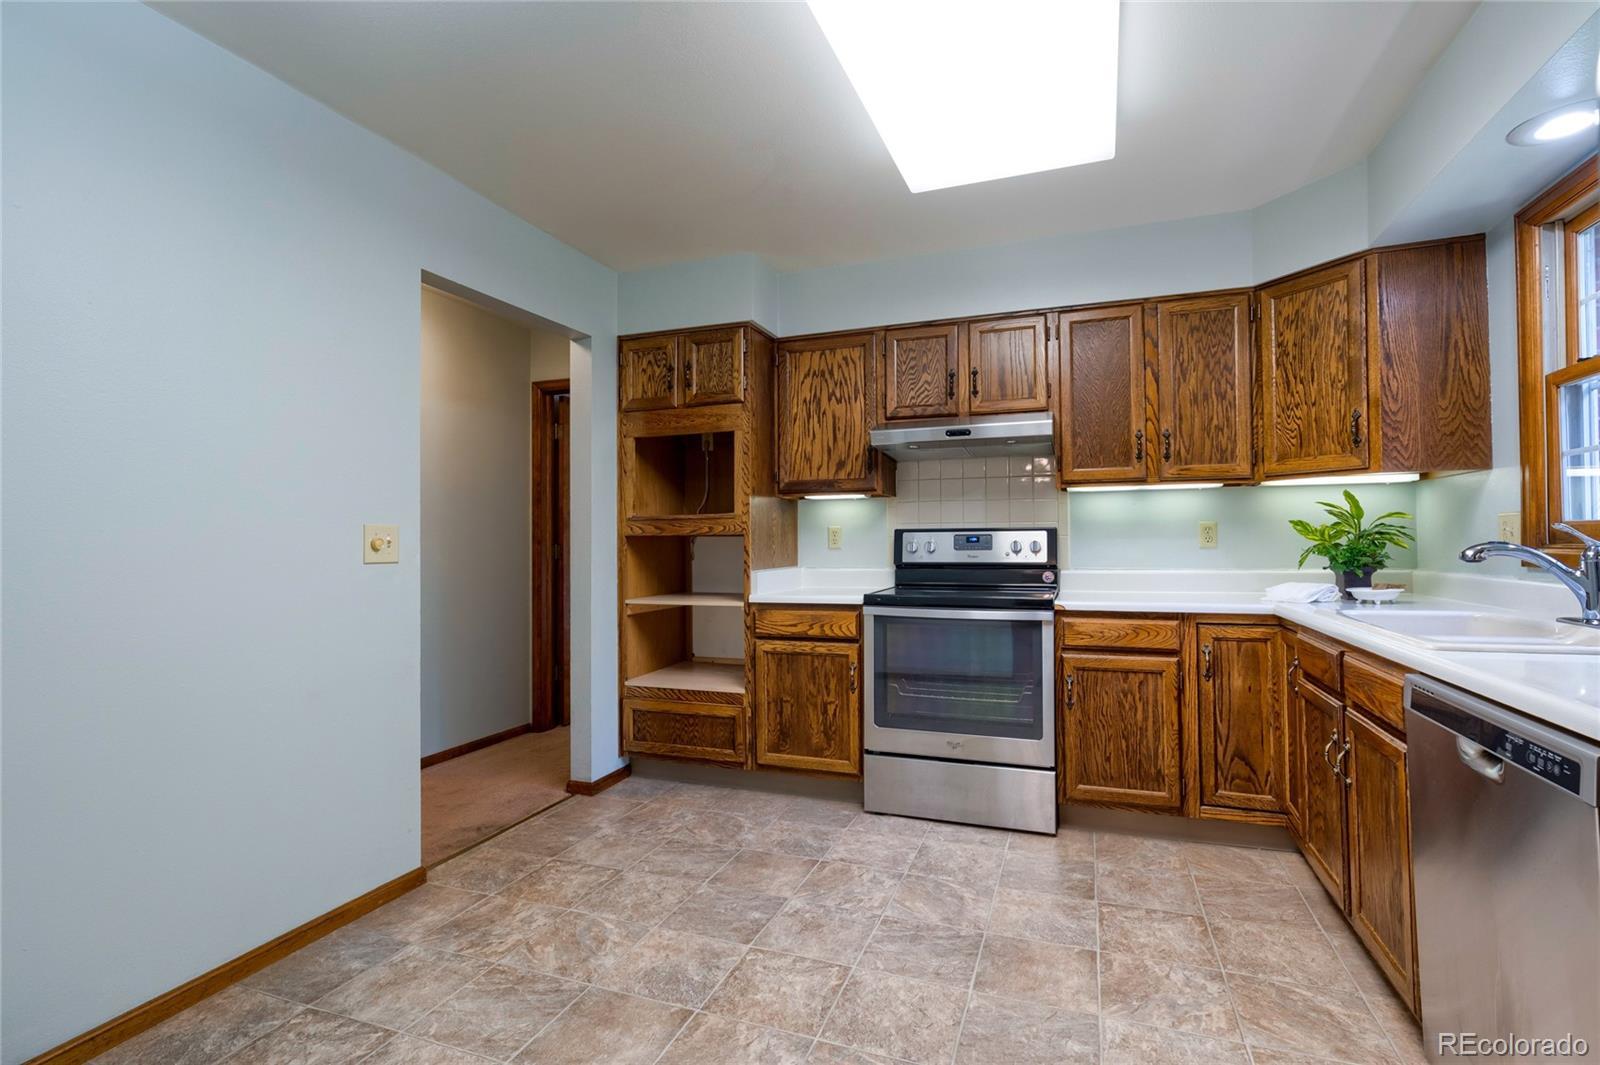 MLS# 6009976 - 16 - 720 Arbor Avenue #16, Fort Collins, CO 80526